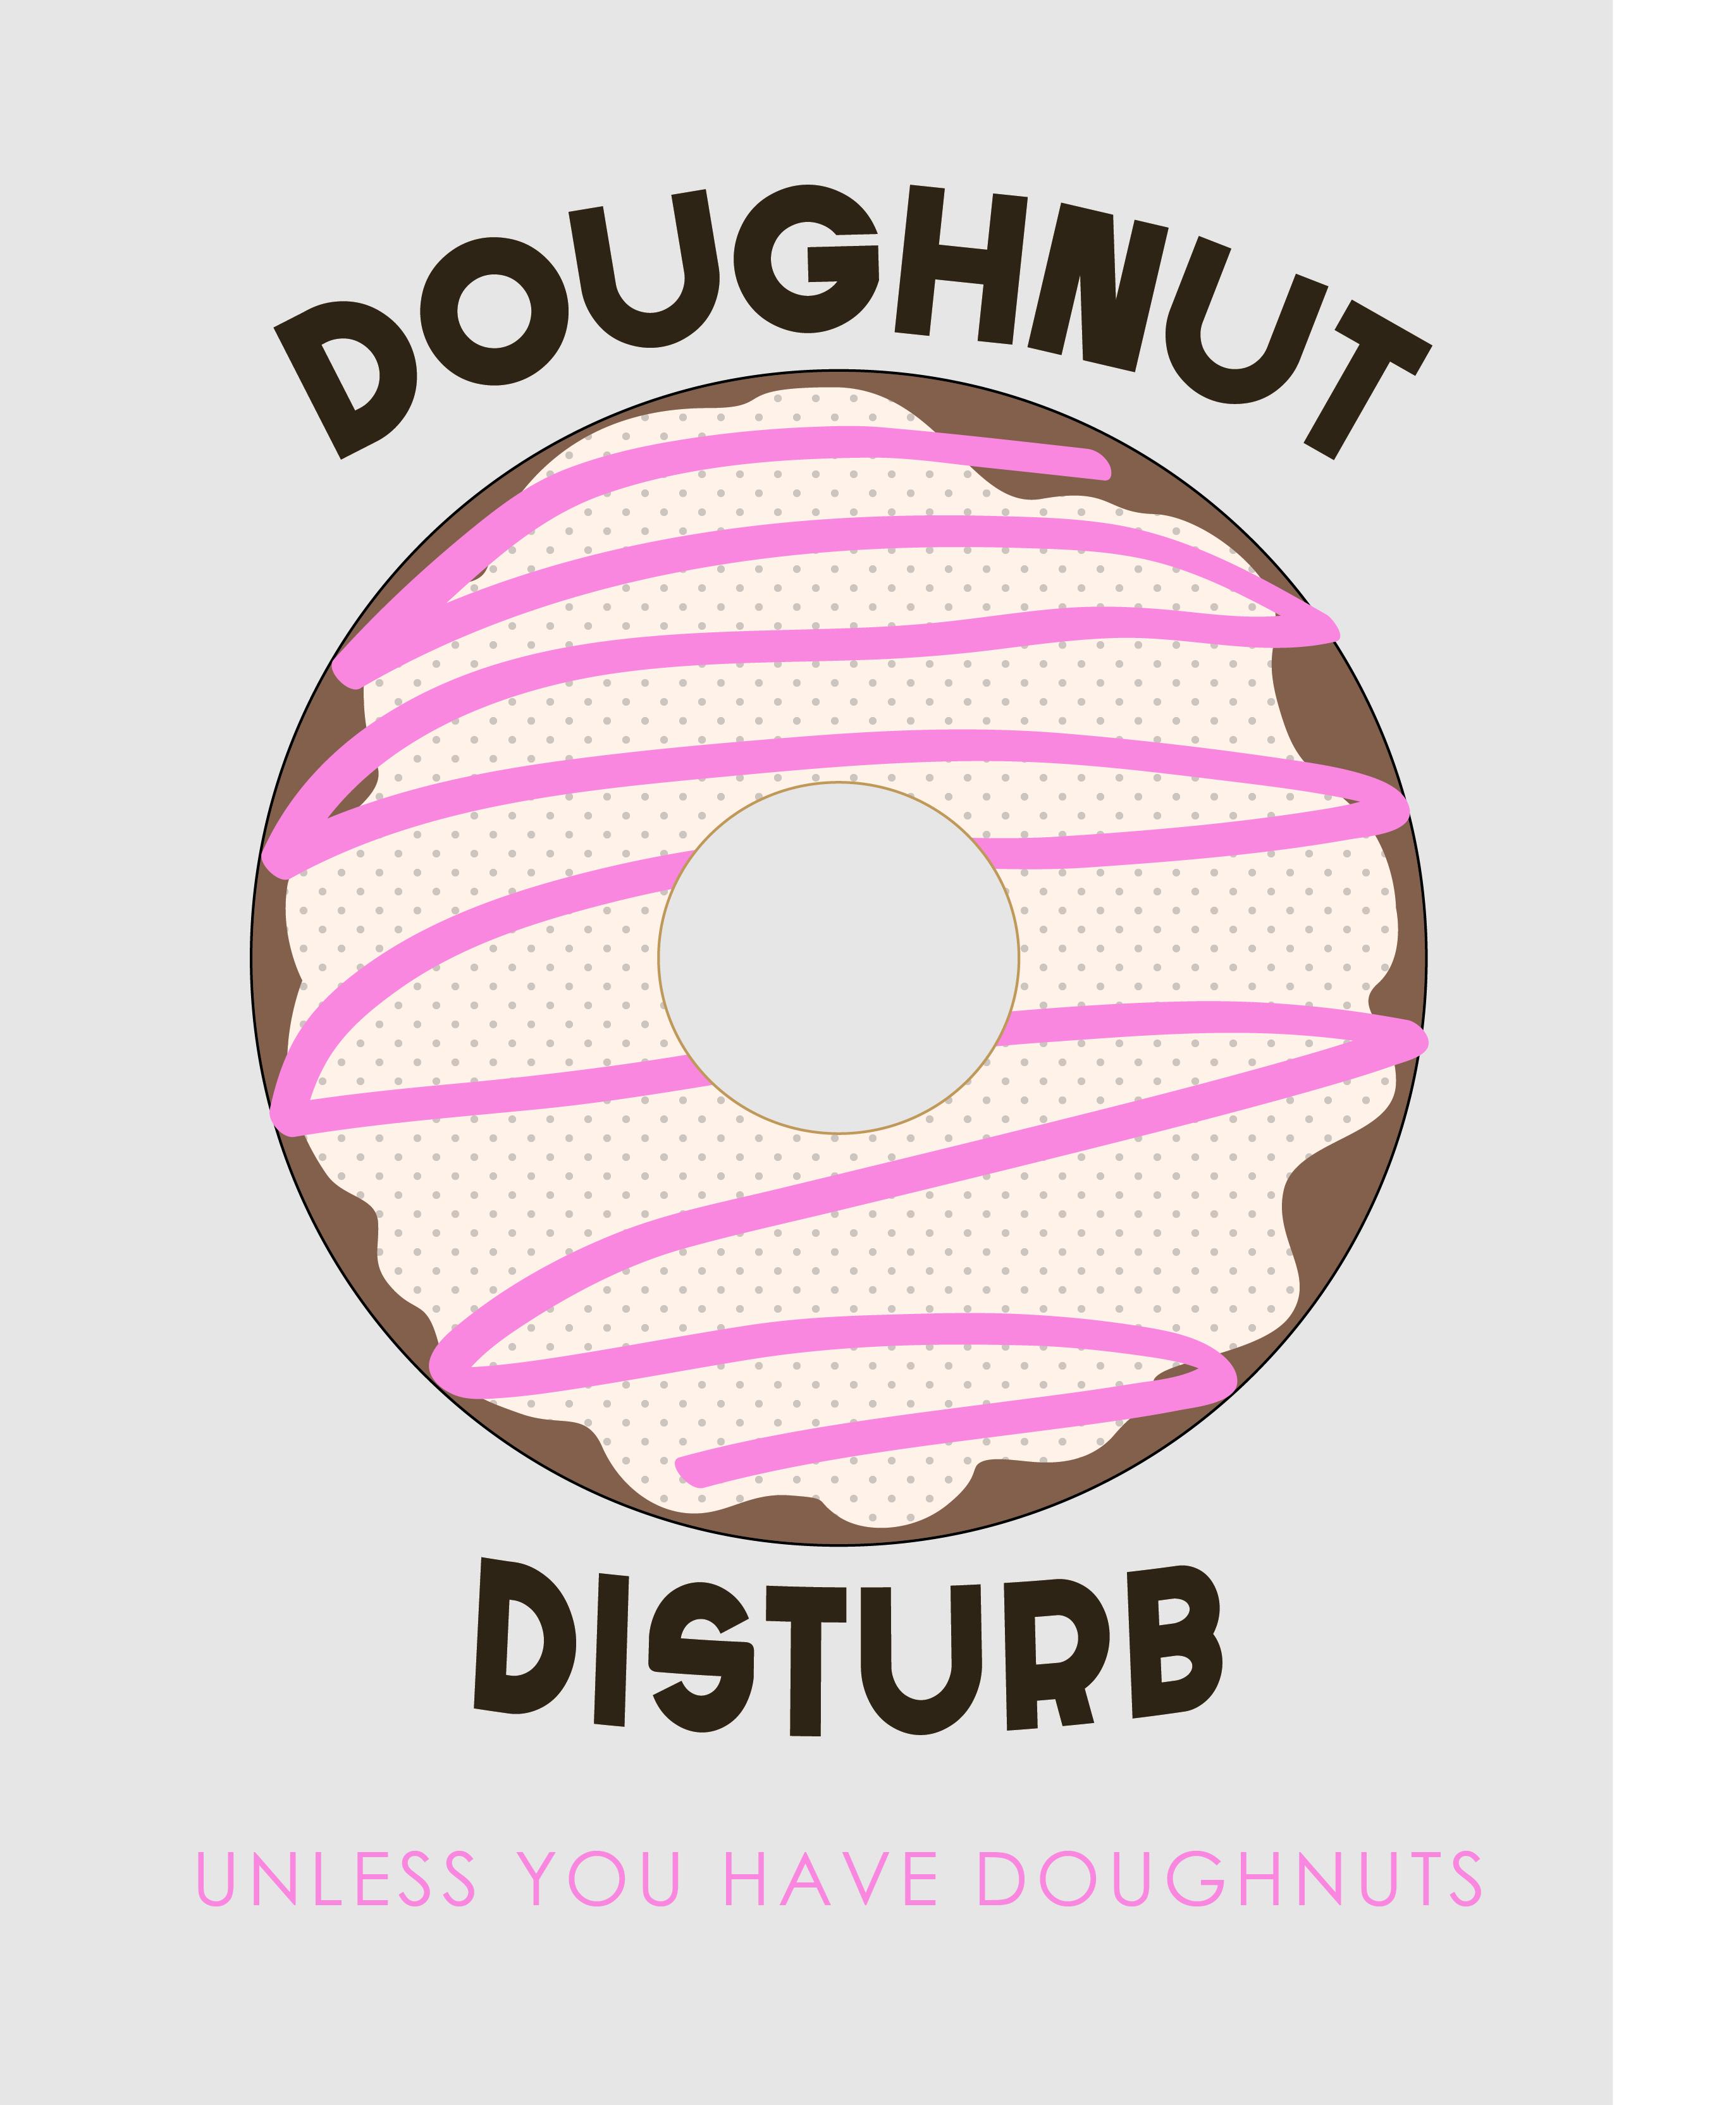 DoughnutDisturb